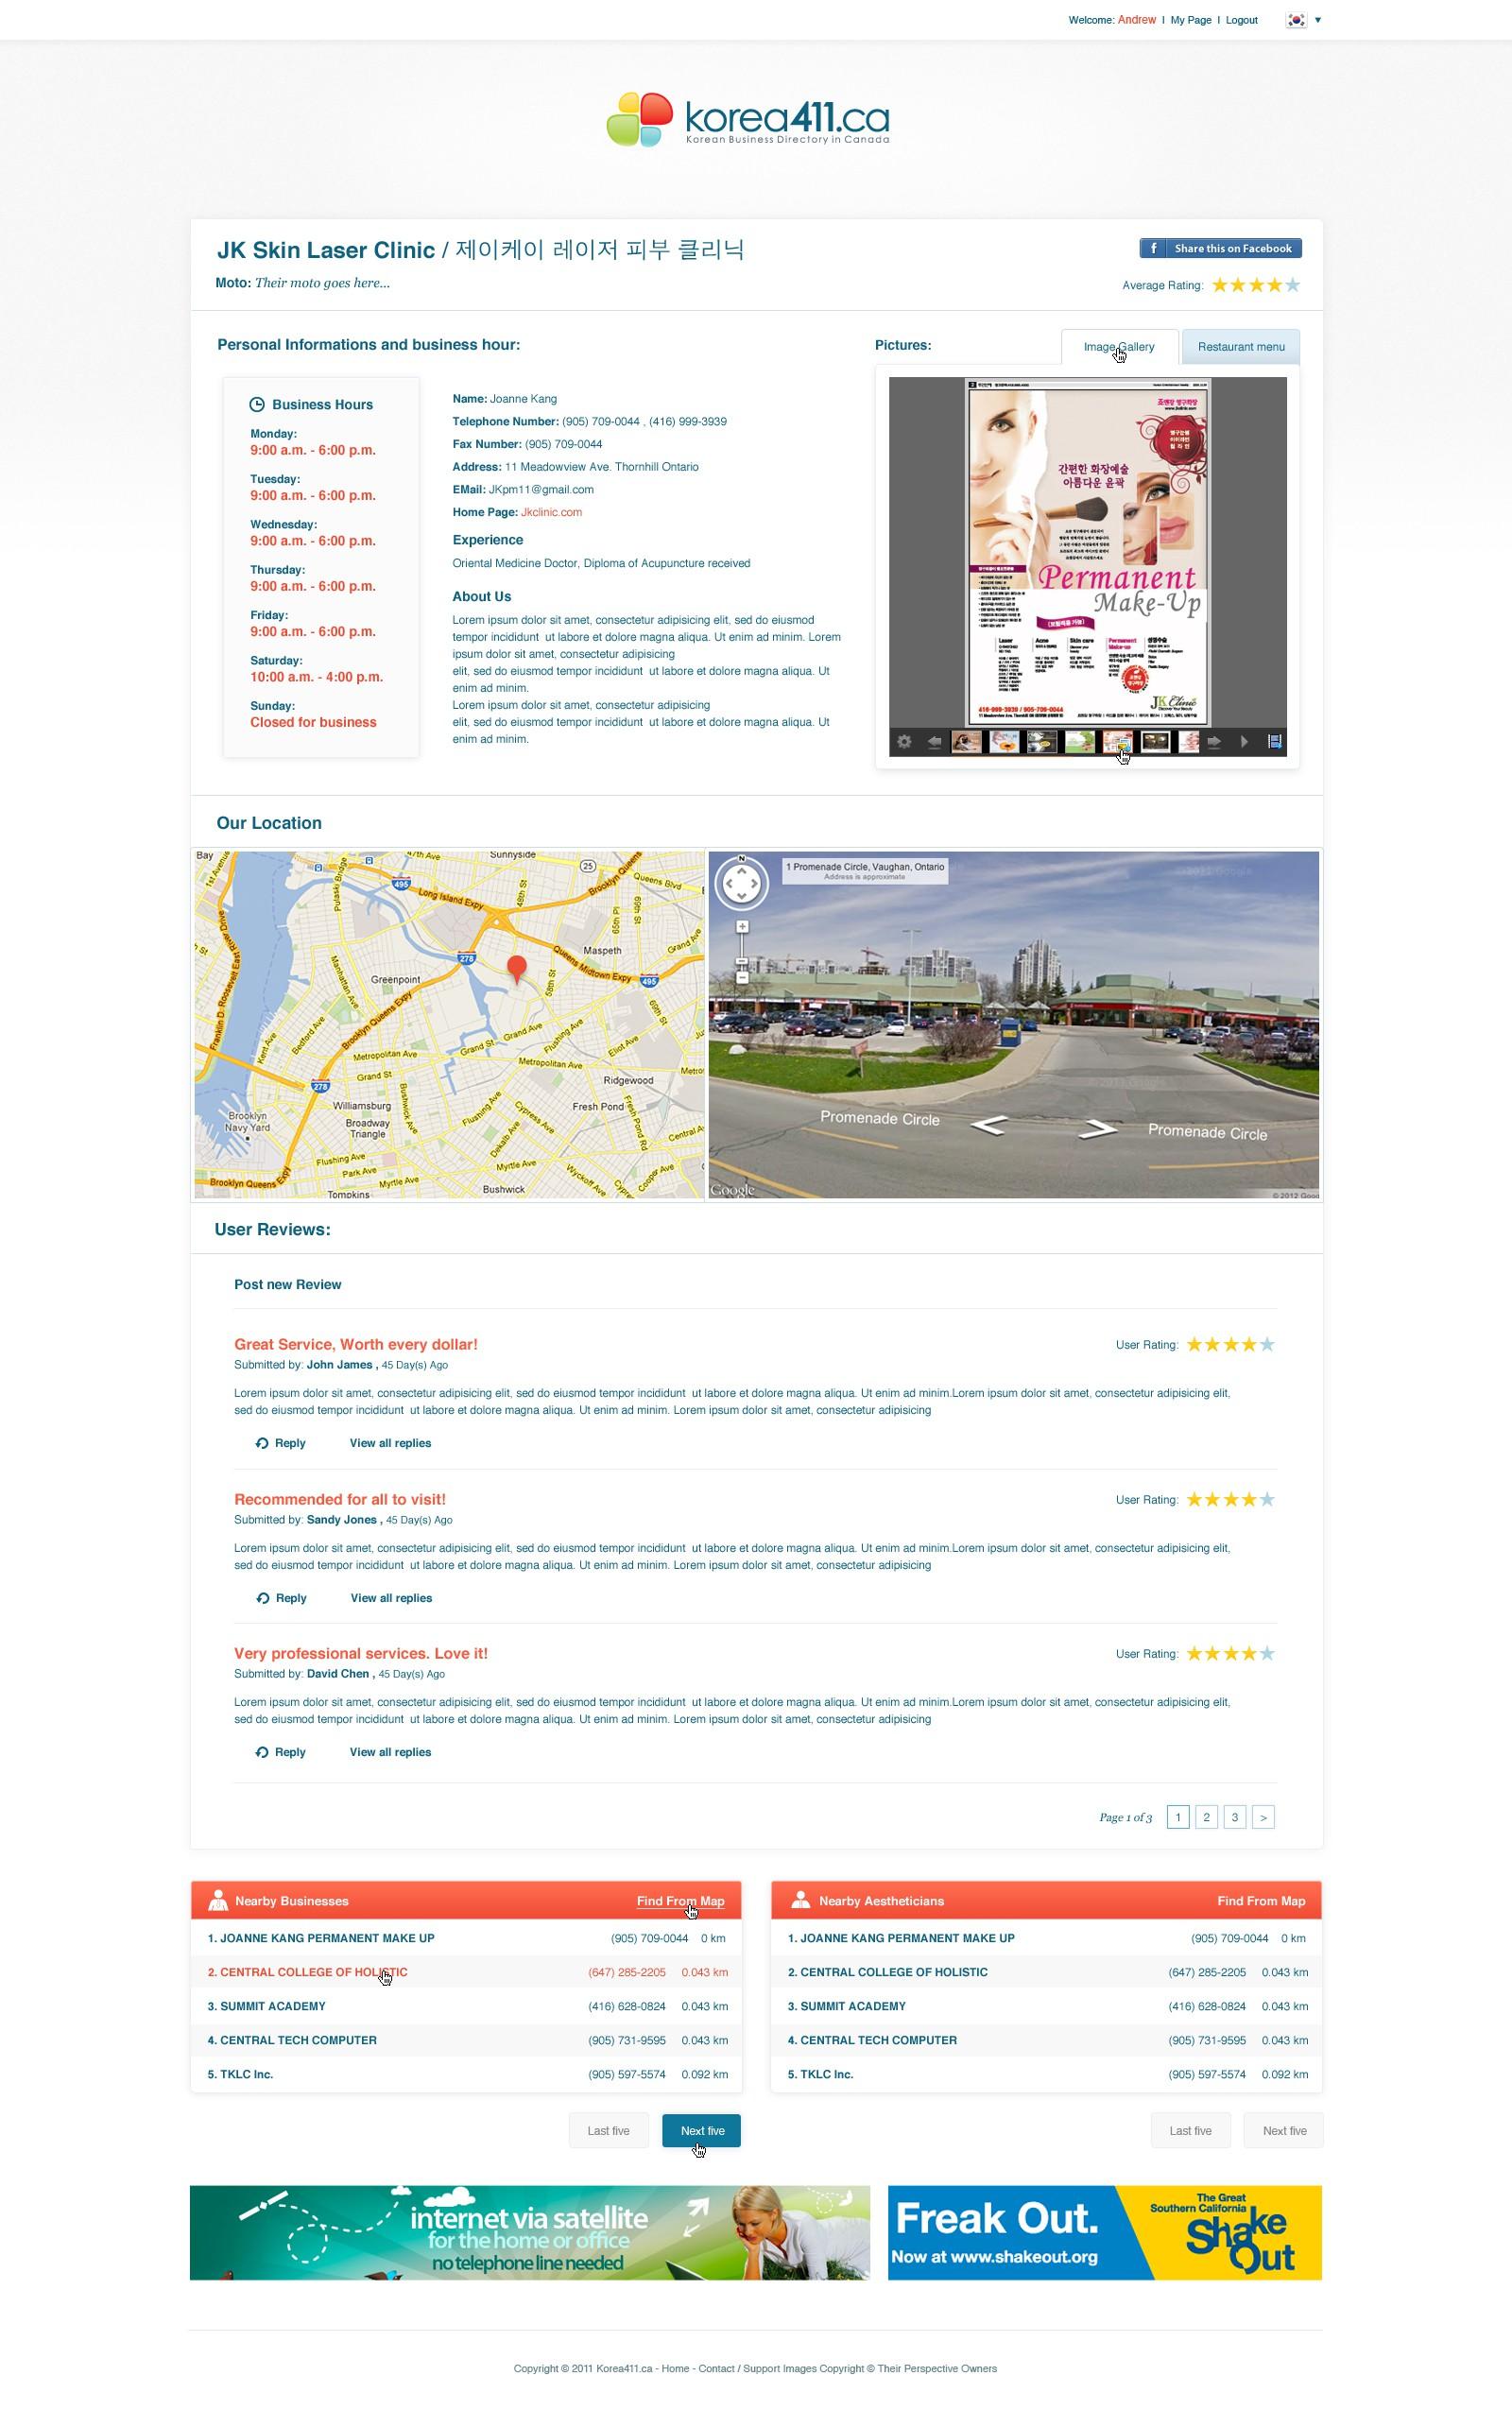 New website design wanted for Korea411.ca